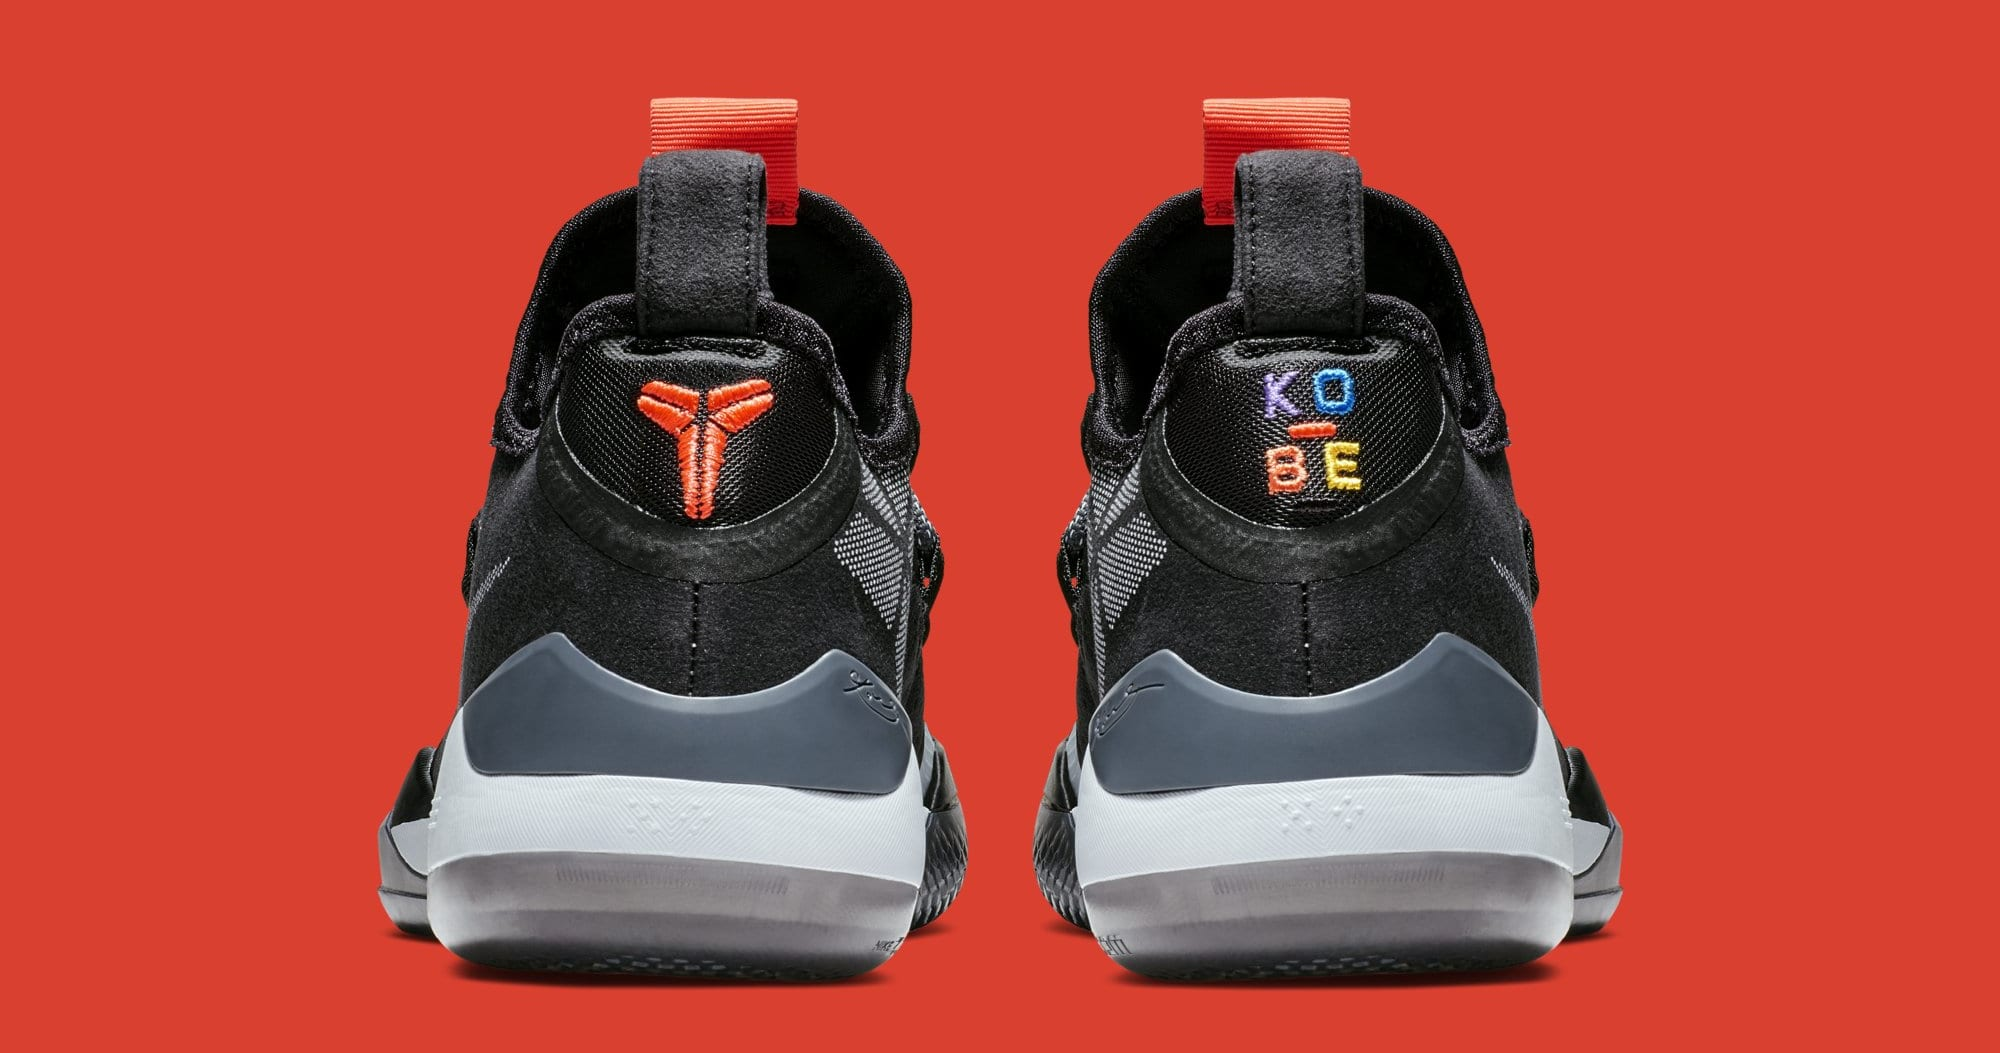 Nike Kobe AD 'Black/Multi' AV3555-001 (Heel)